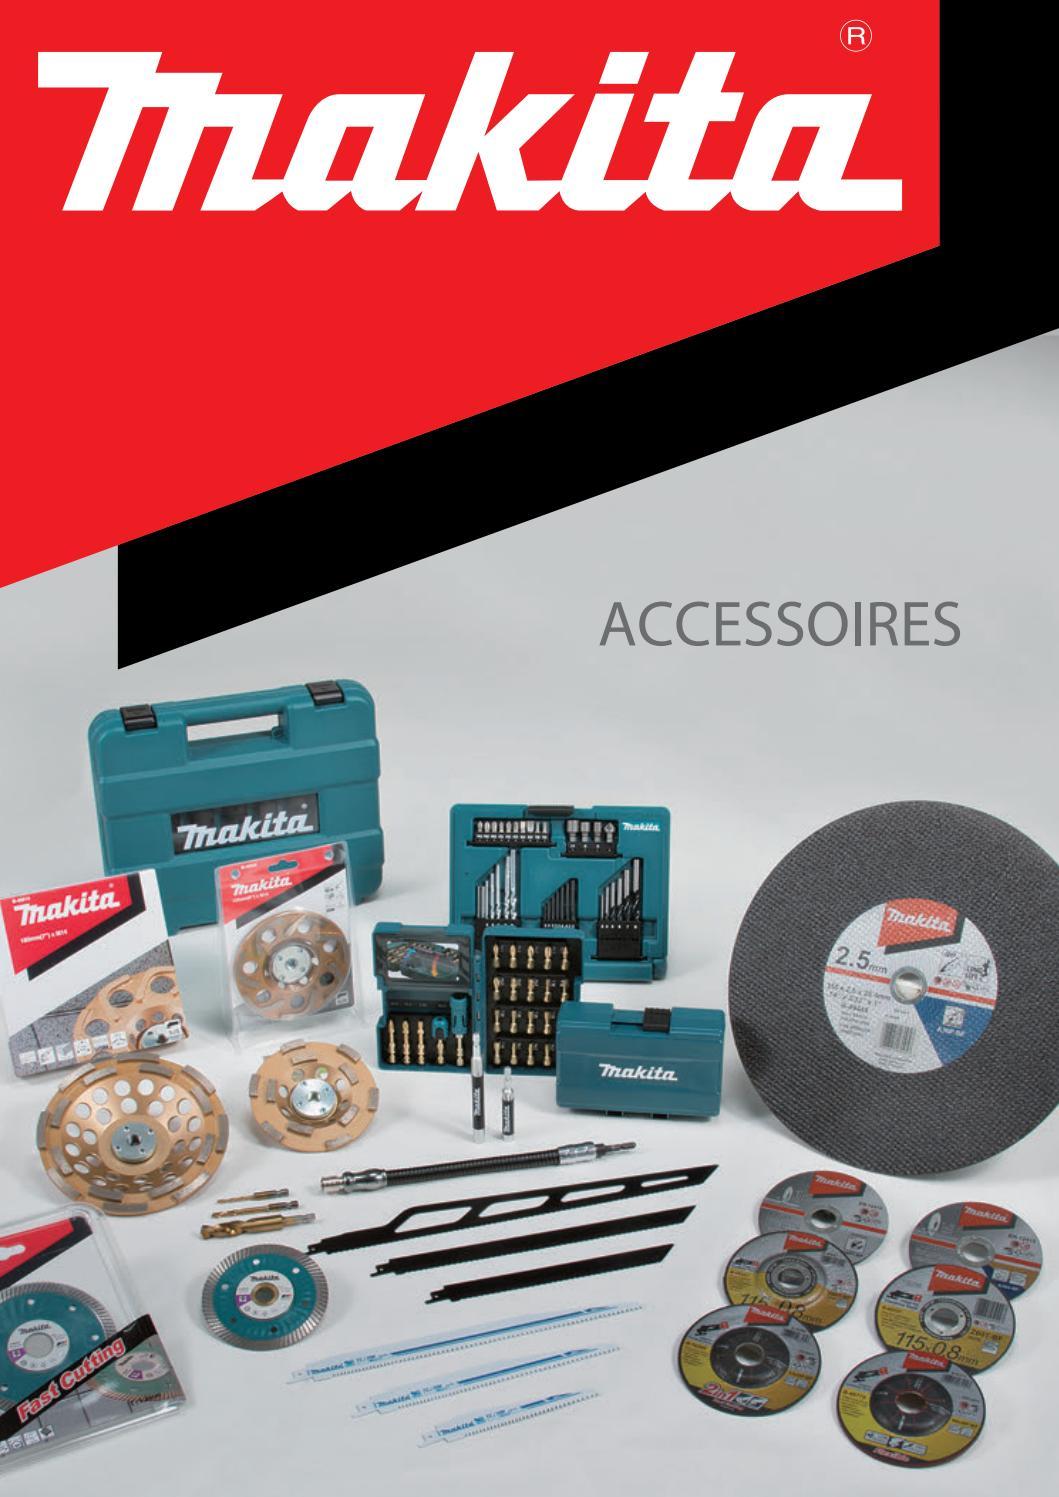 Makita catalogus accessoires 2016-2017 by Mapeco - issuu